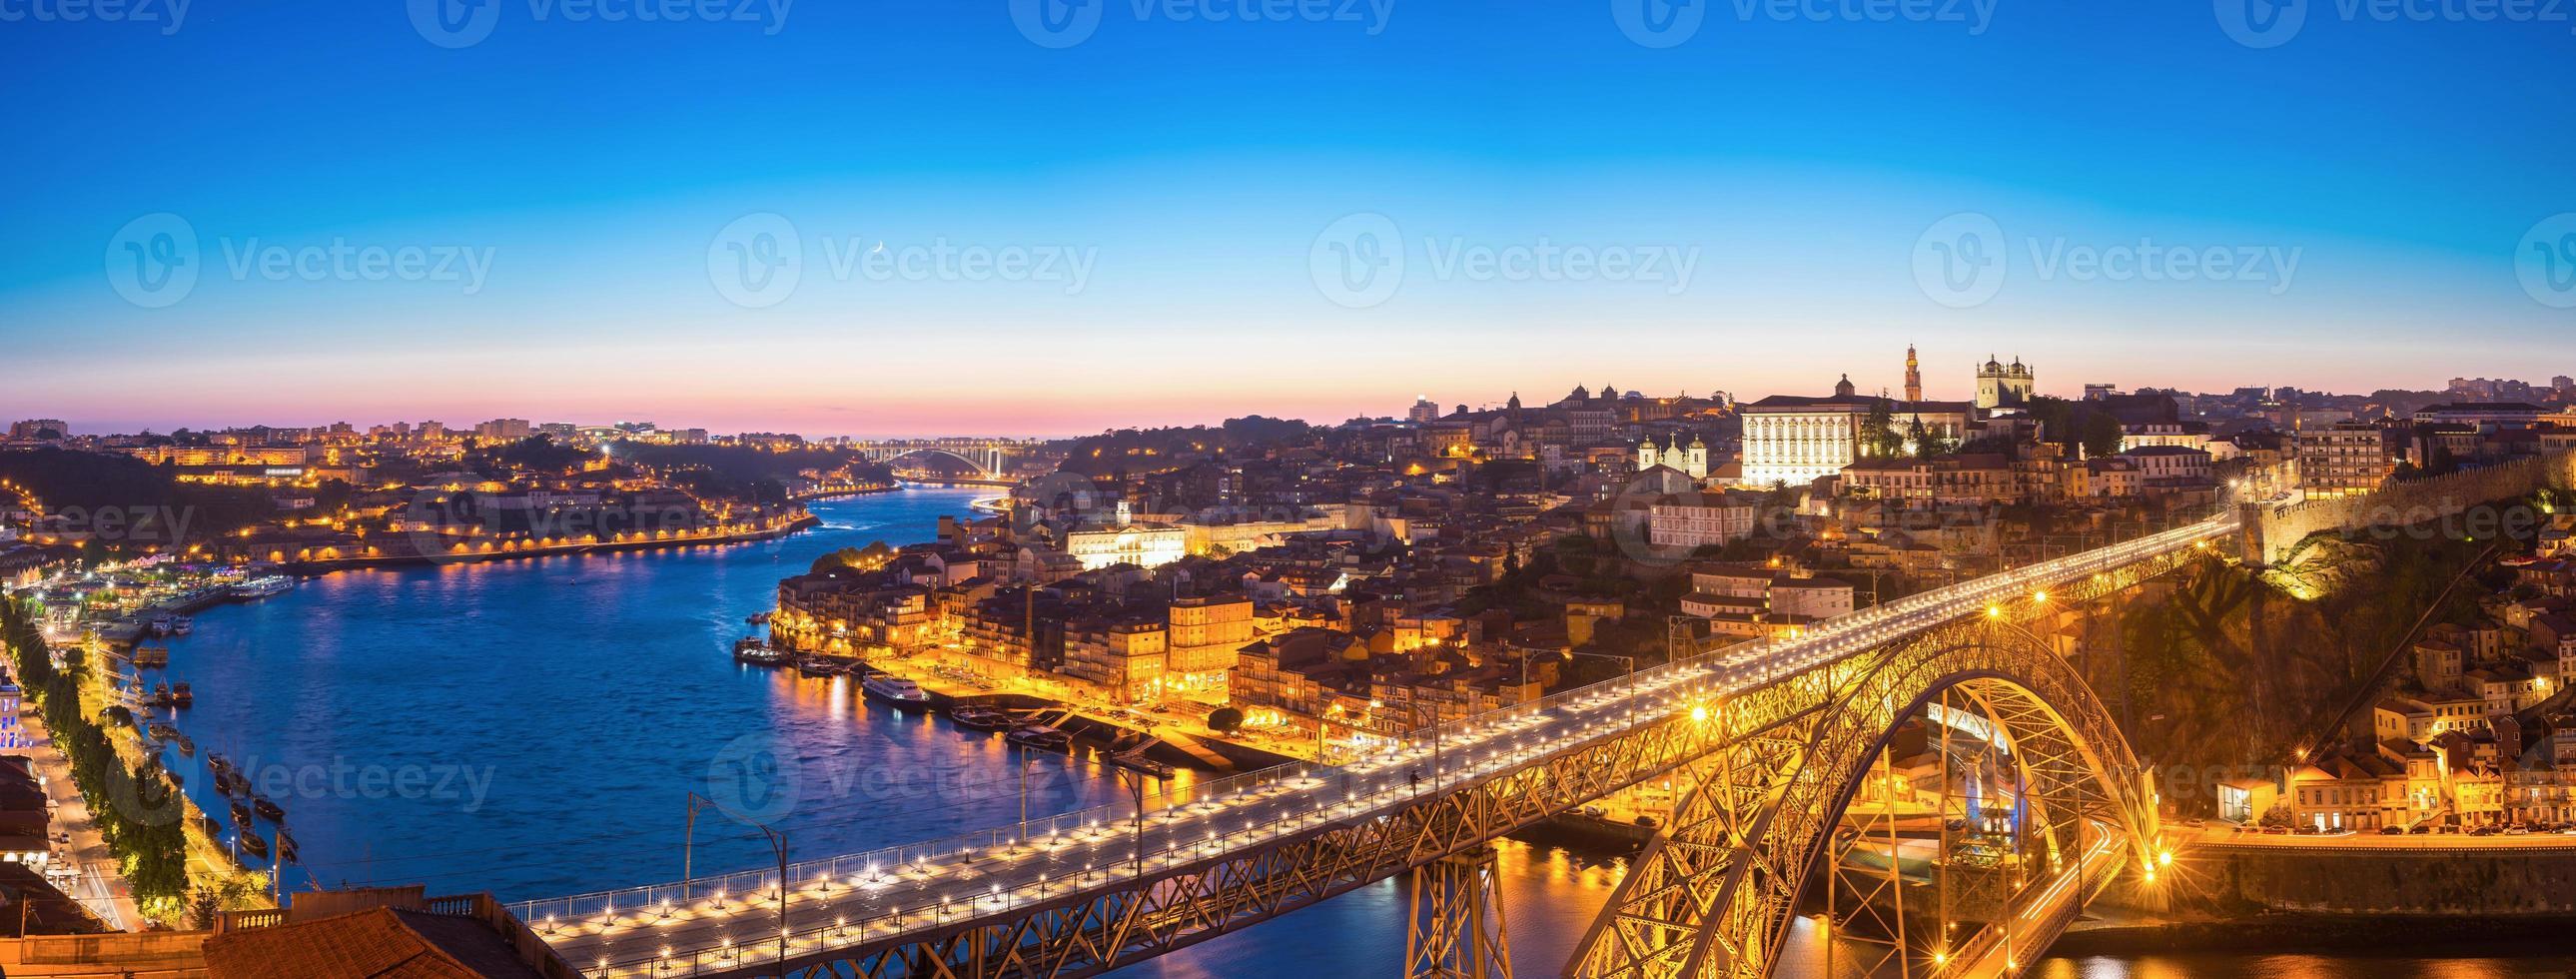 panorama del puente dom luiz foto